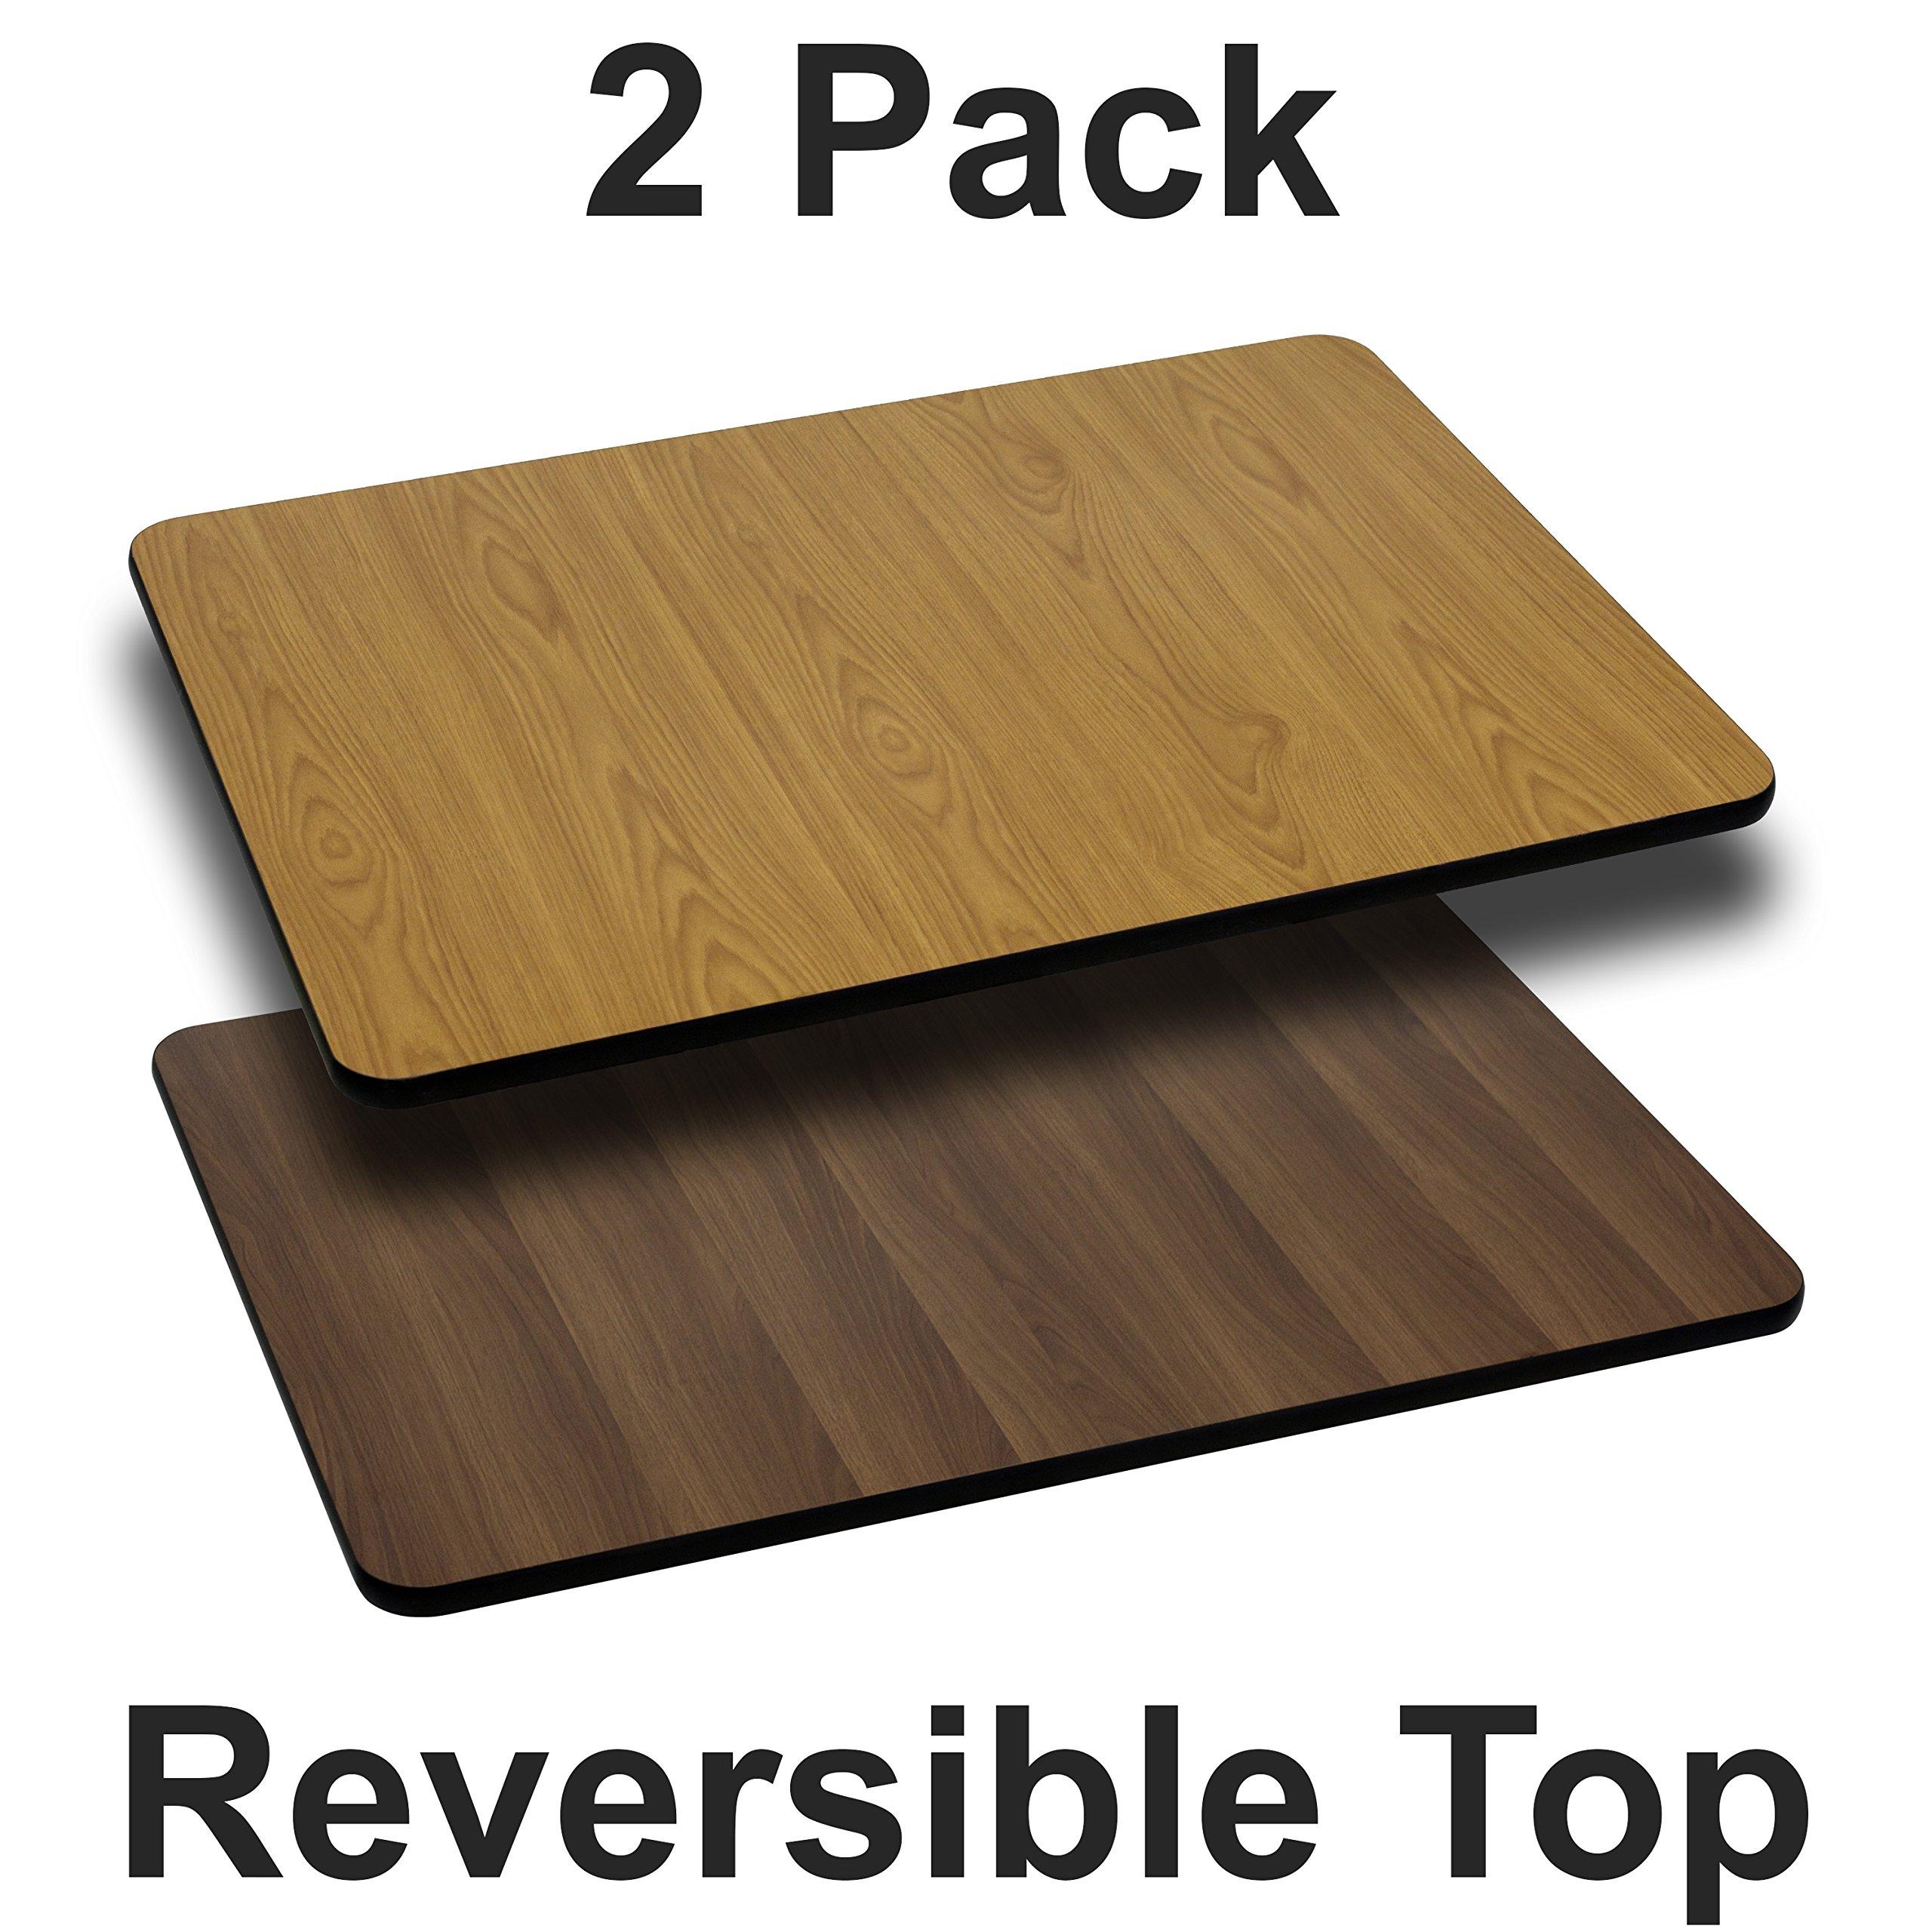 Flash Furniture 2-XU-WNT-2442-GG 24x42 NA/WA Reversible Laminate Tops, 2 Pack, Natural/Walnut